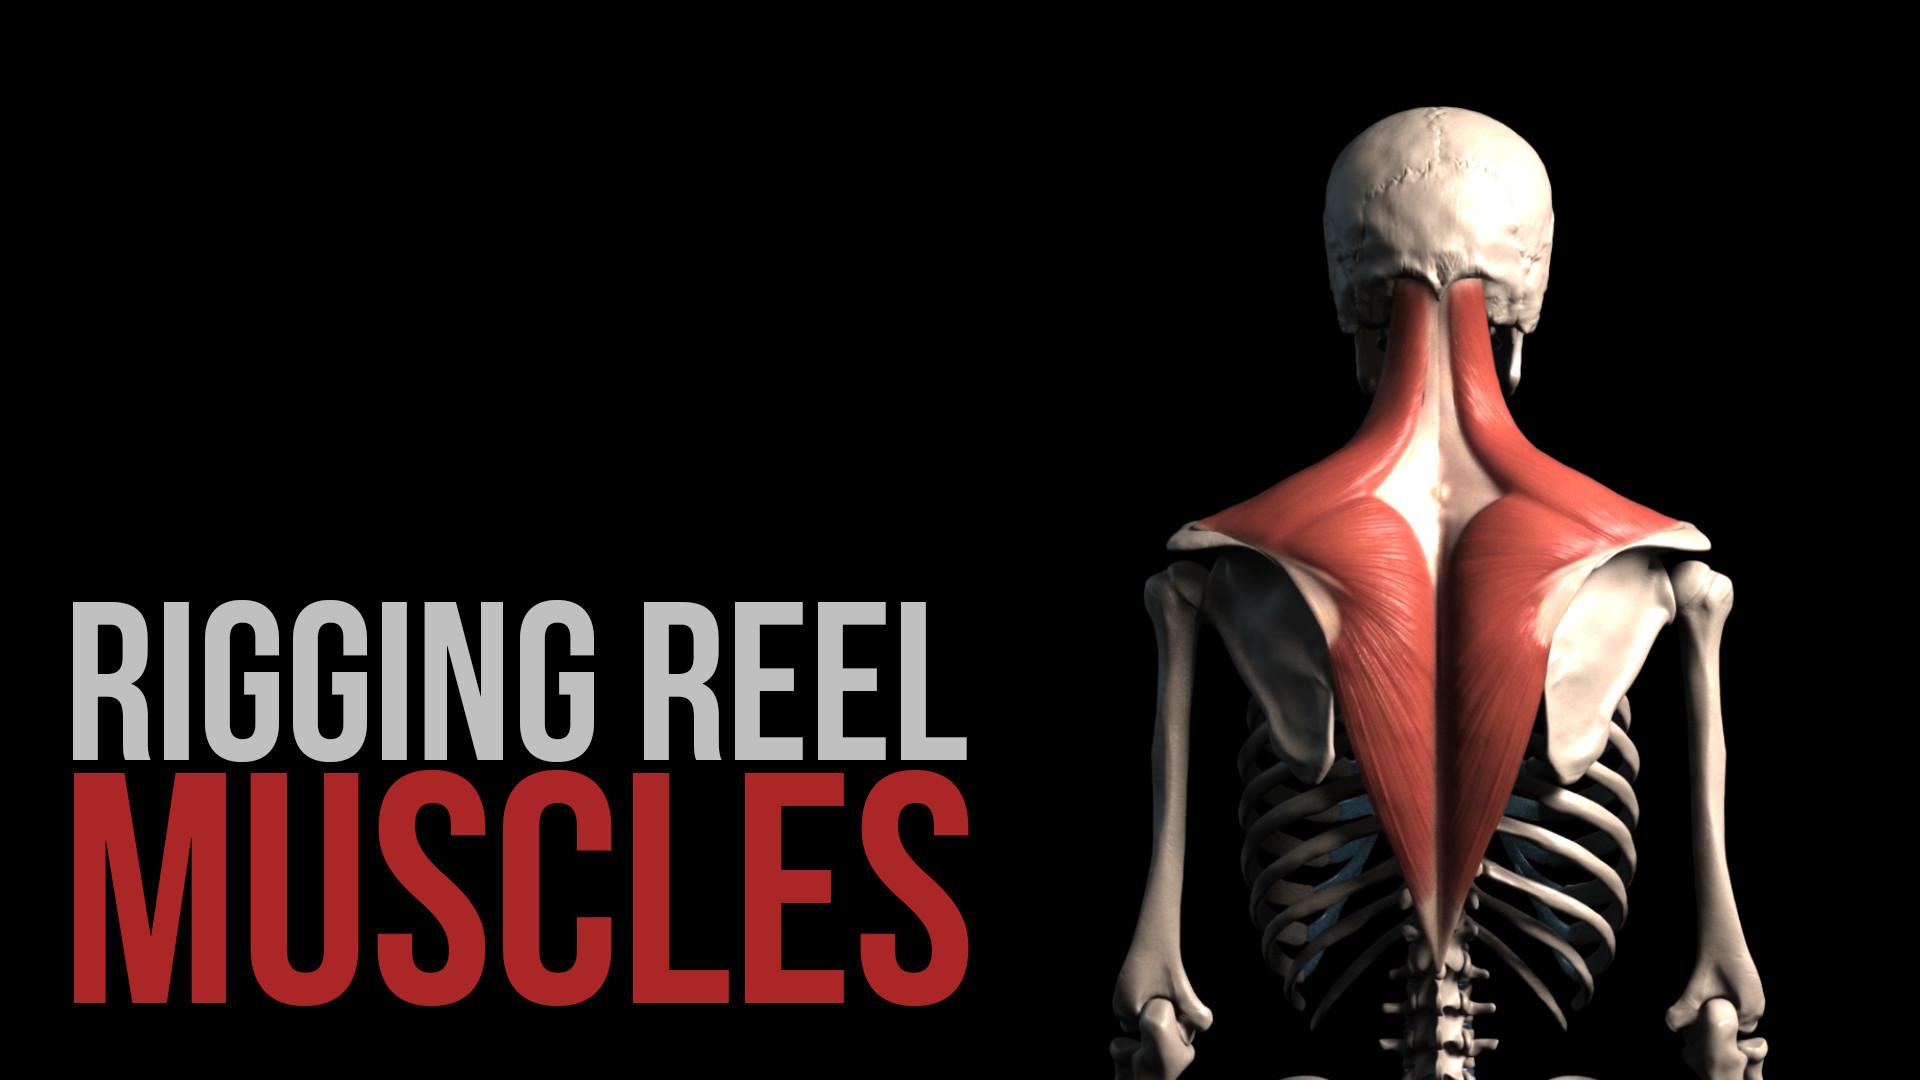 ArtStation - Anatomy Rigging demoreel, Alexander Lee